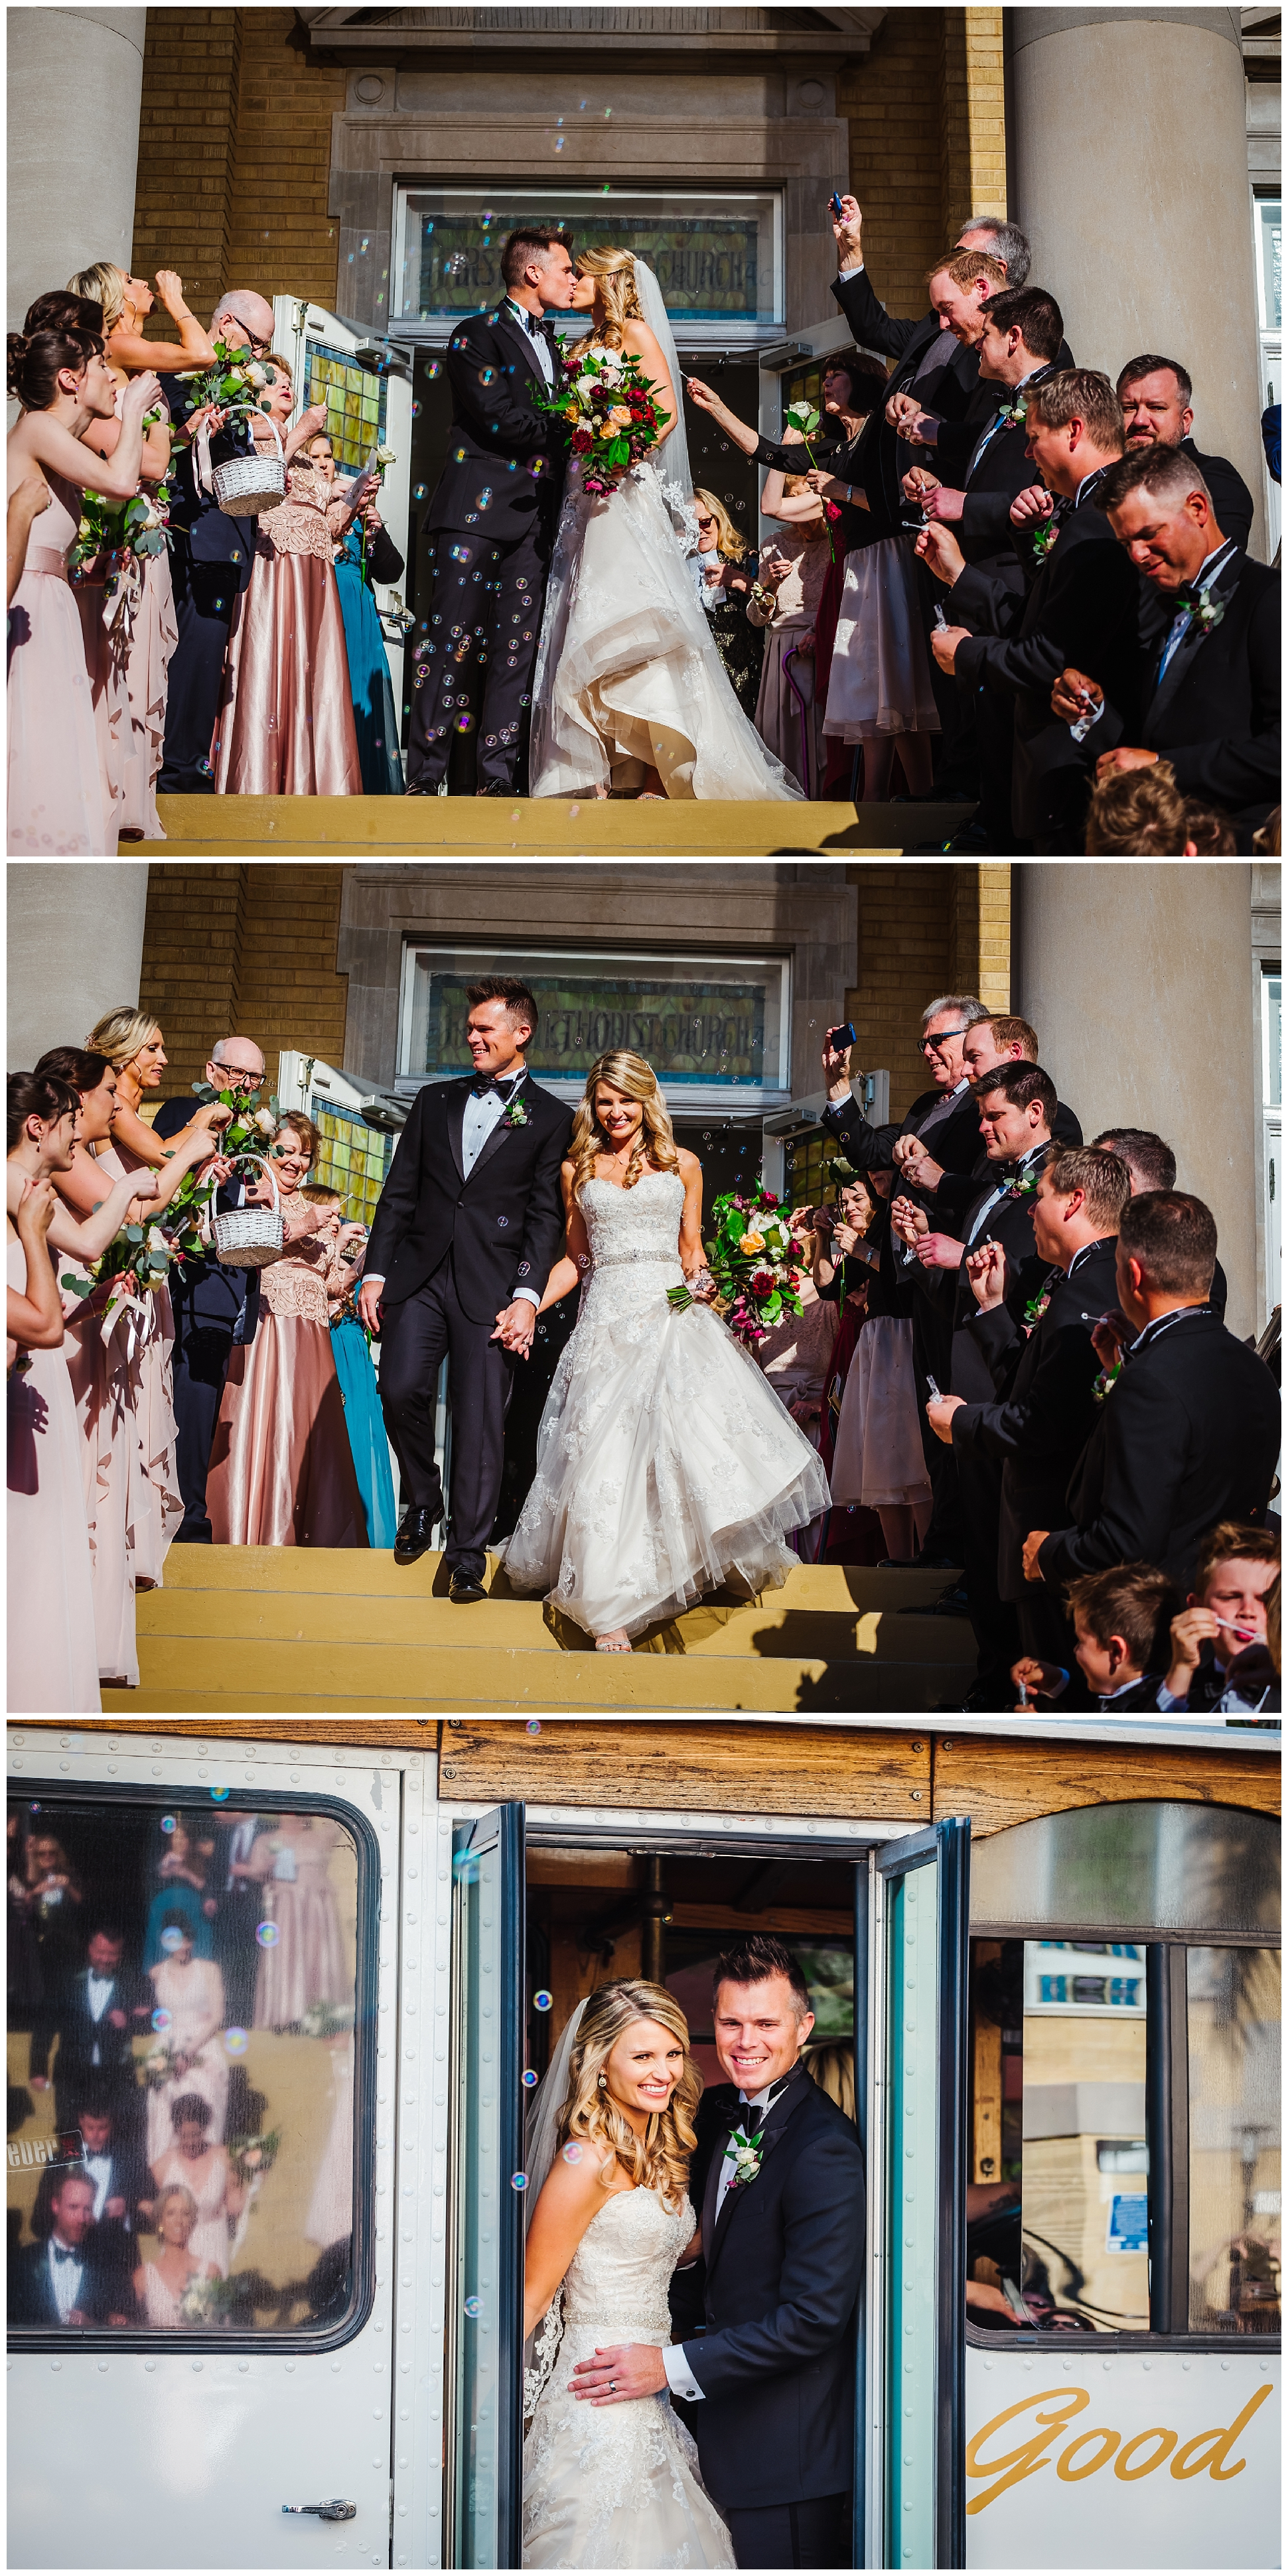 tampa-bradenton-wedding-photographer-south-florida-museum-classic-blush-gold-alpacas-sparklers_0057.jpg